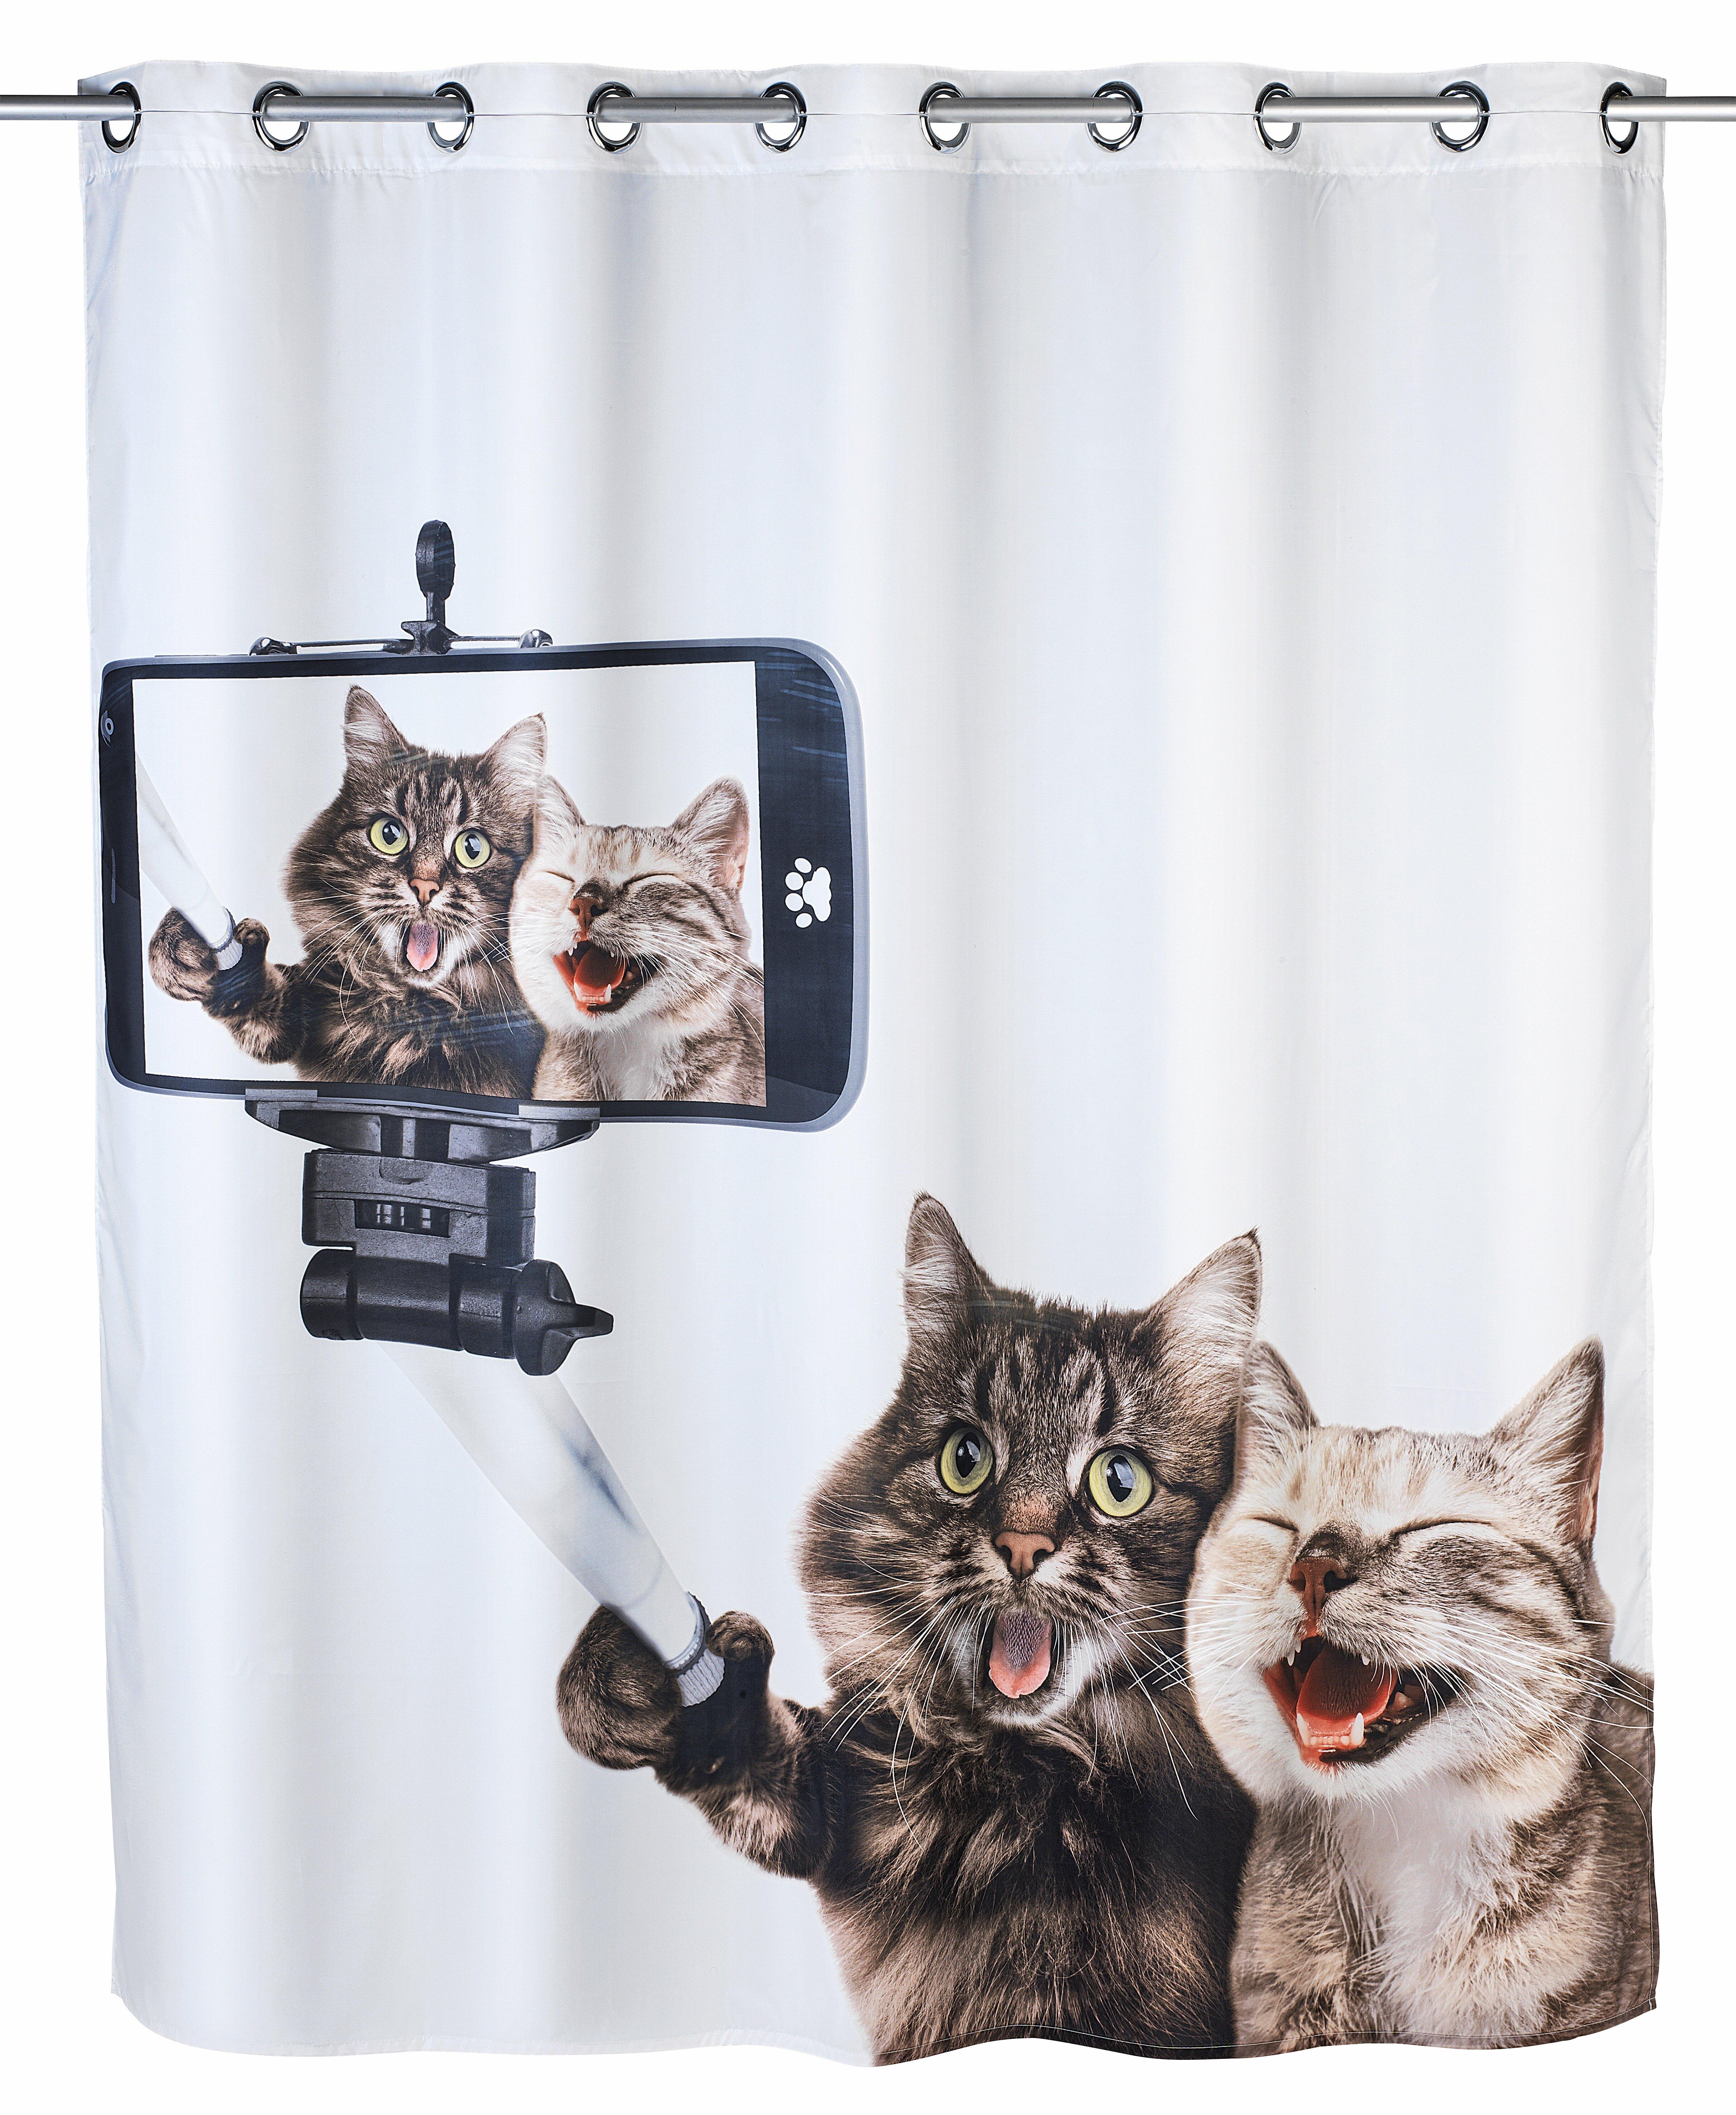 Wenko Selfie Cat Shower Curtain & Reviews | Wayfair.co.uk